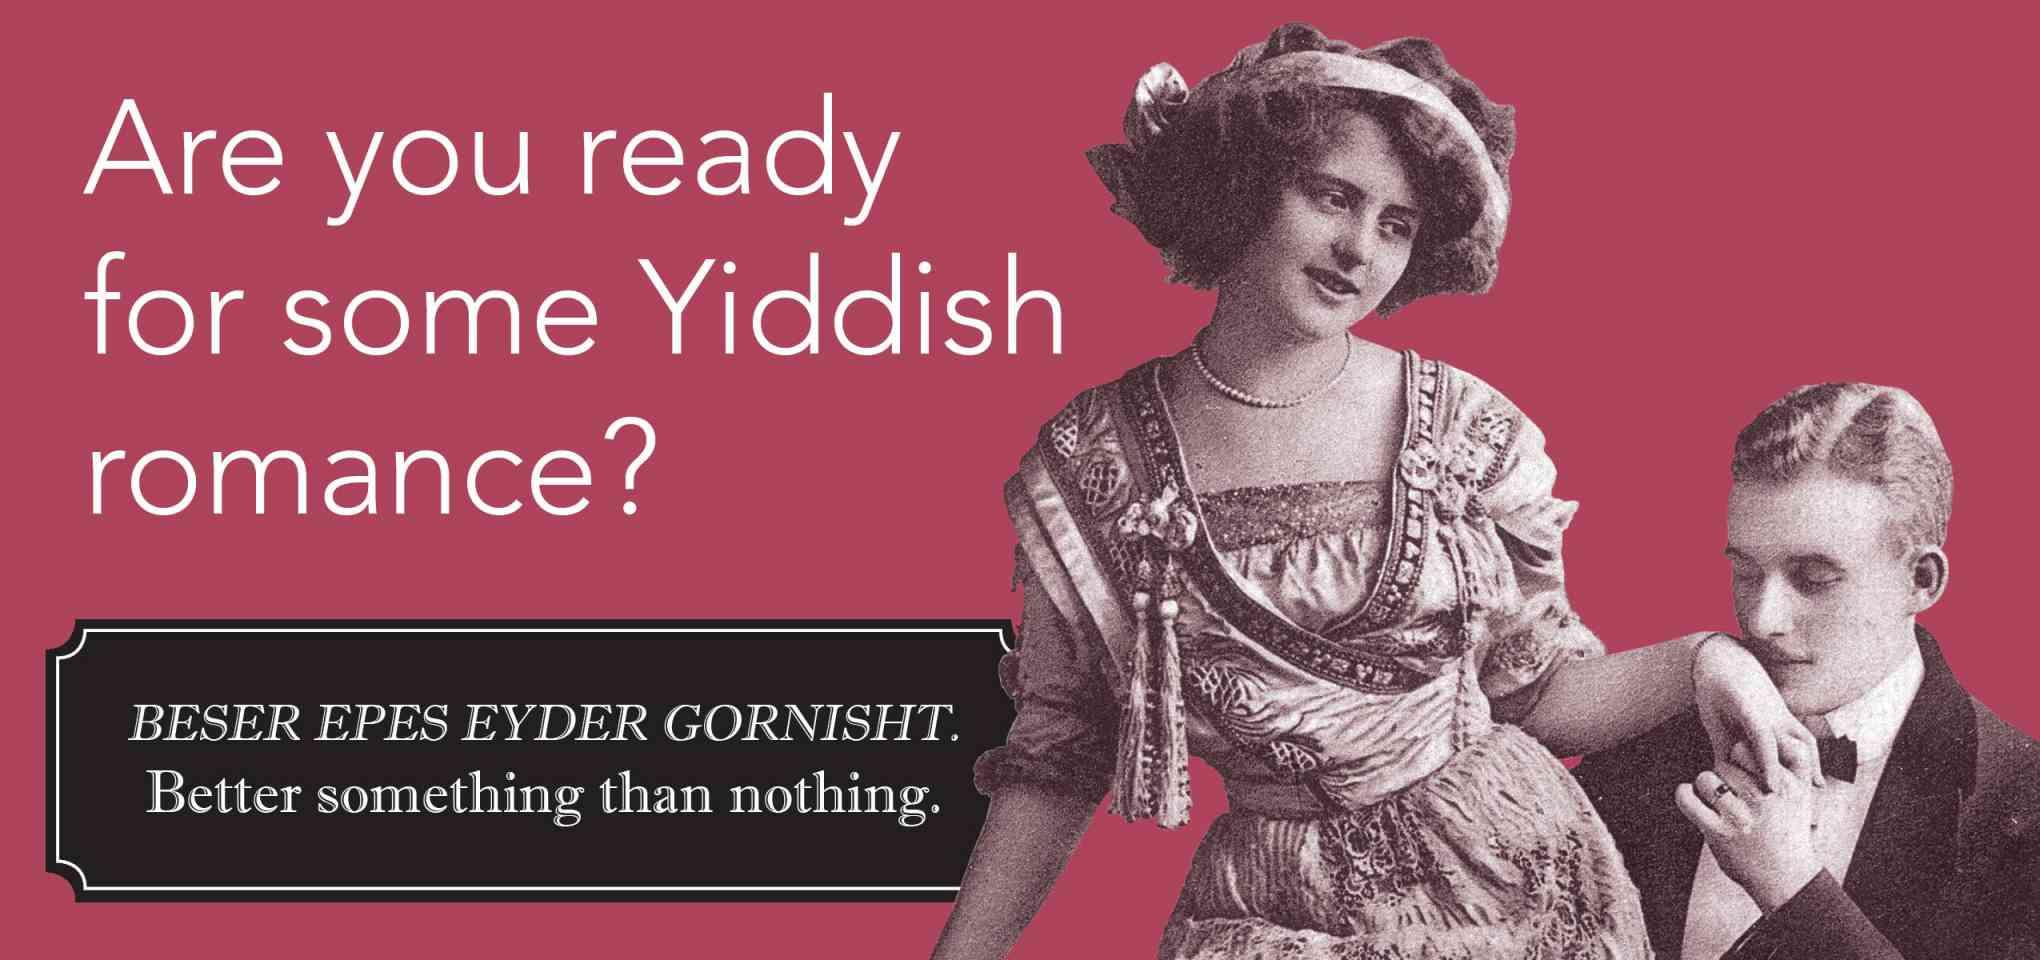 yiddish pour le matchmaking kenyan Gay Dating site